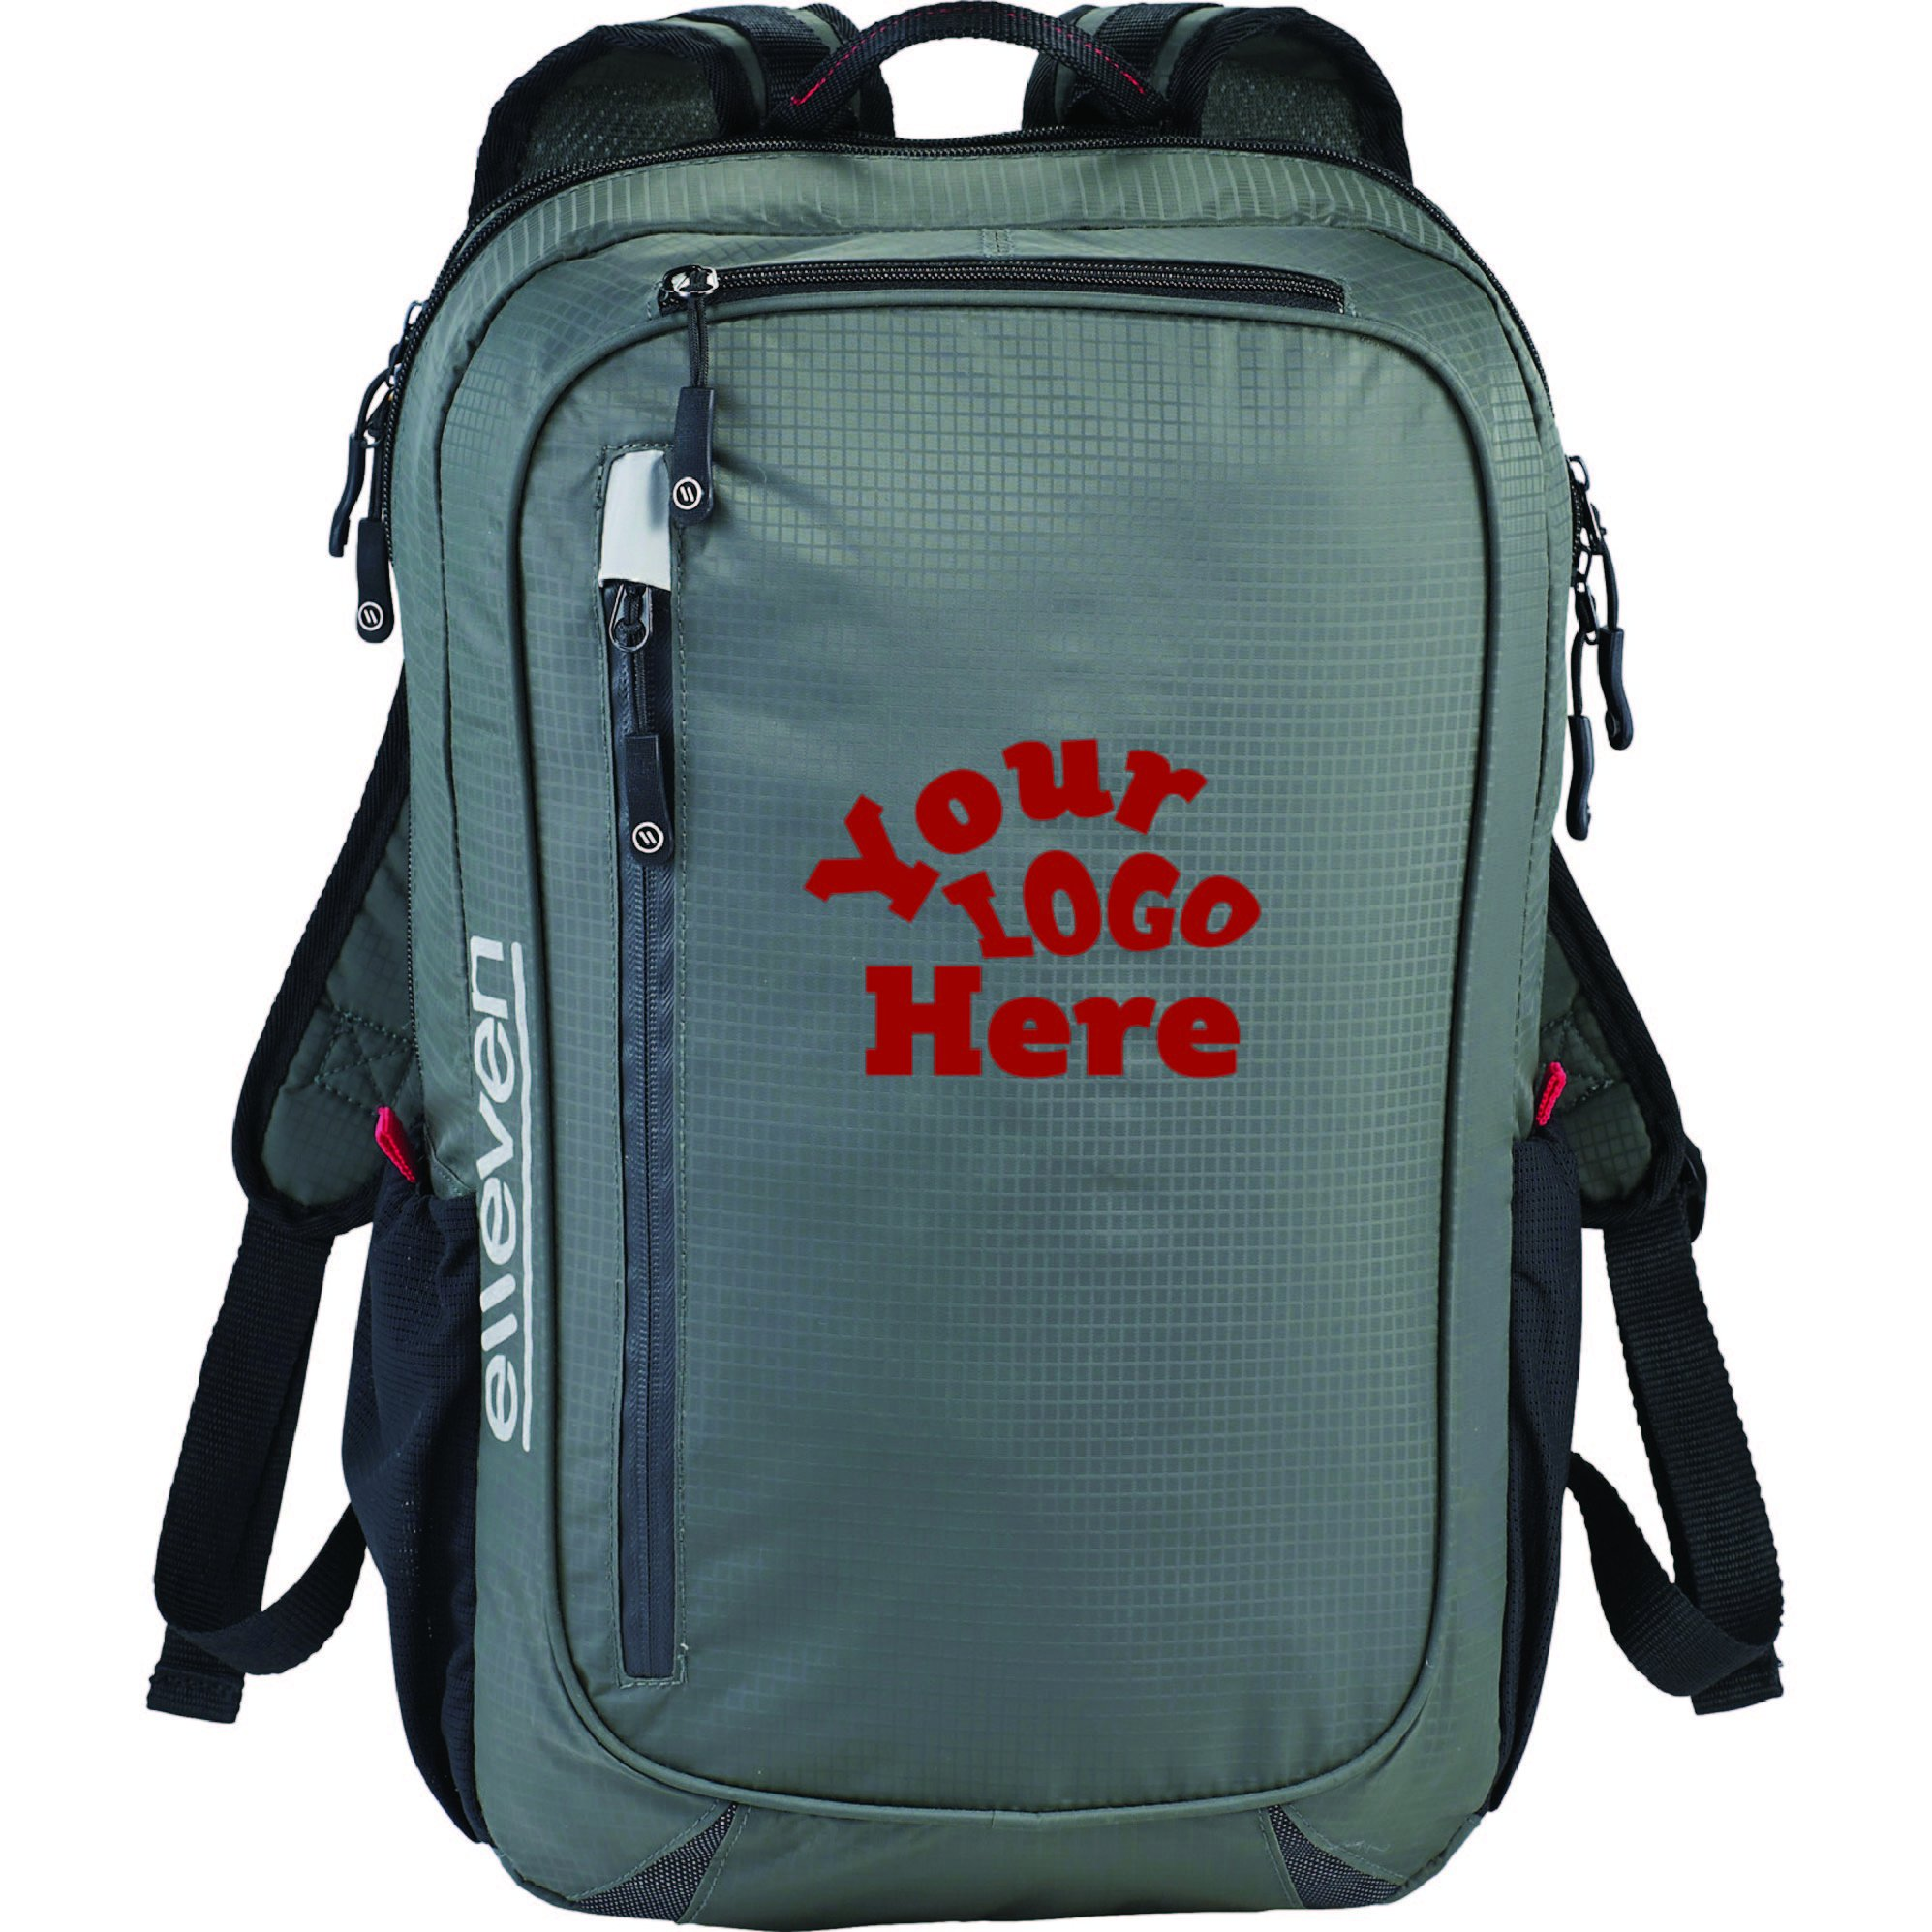 elleven Lunar Lightweight 15'' Computer Backpack (Qty 12 $45.62 each) (Full Color Transfer Print)